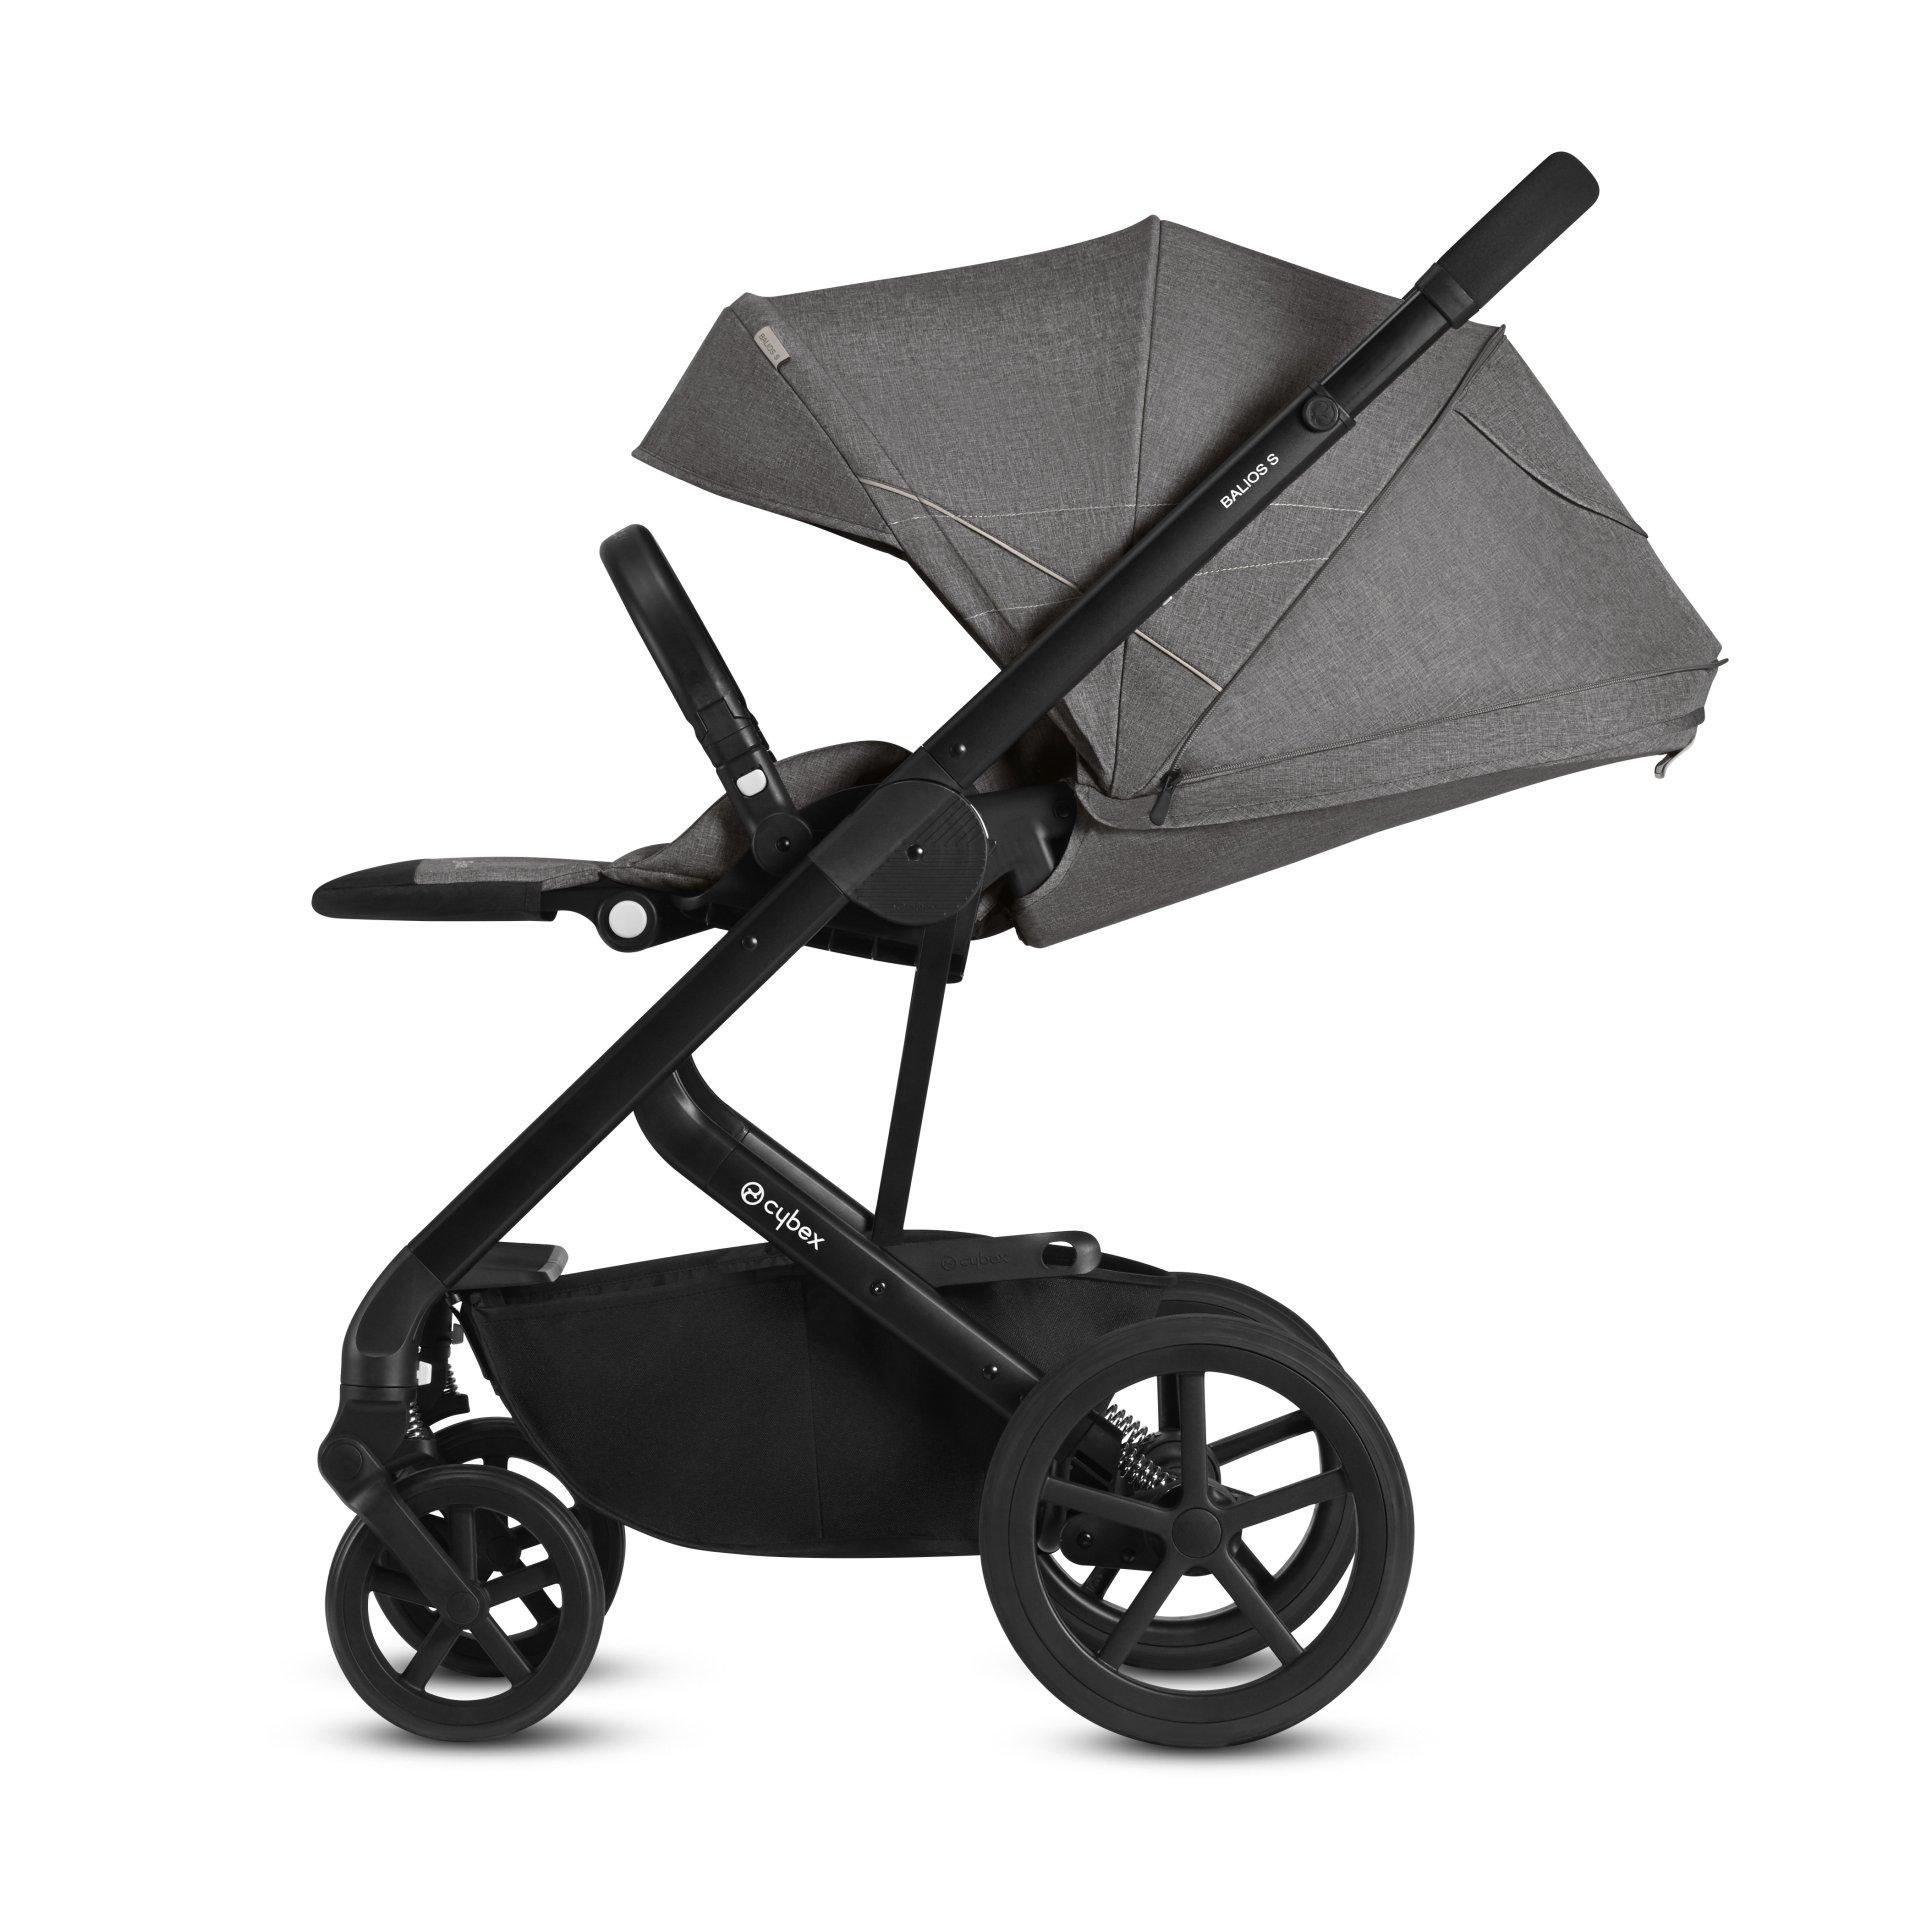 cybex stroller balios s 2018 lavastone black black buy at kidsroom strollers. Black Bedroom Furniture Sets. Home Design Ideas